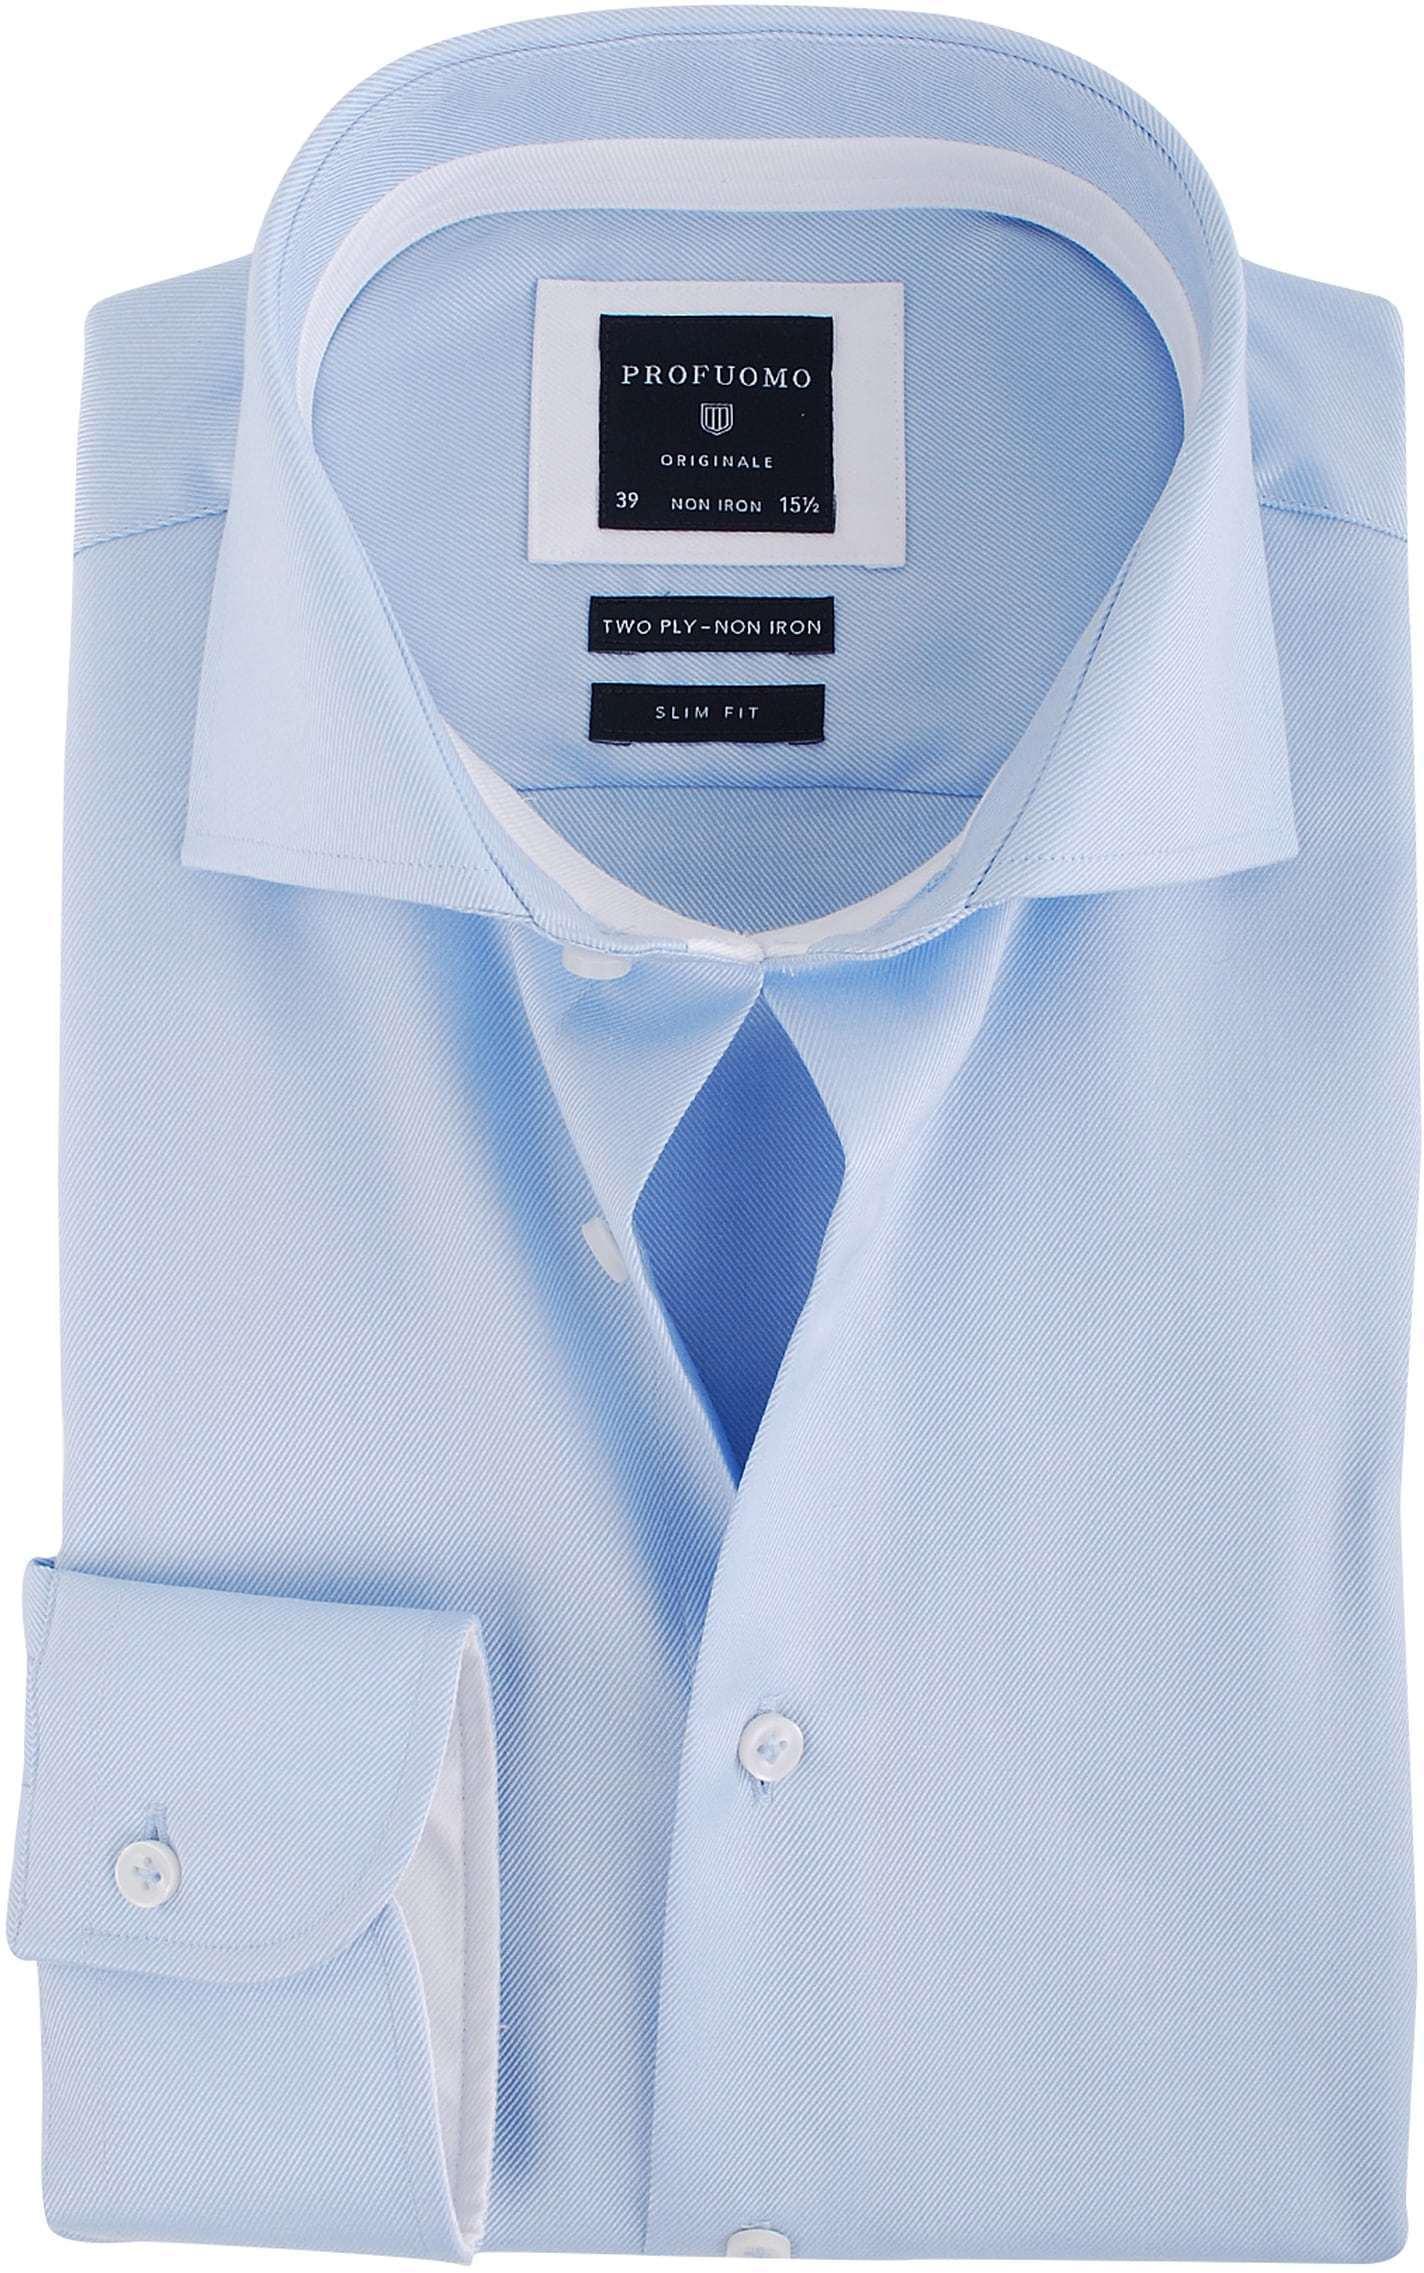 Profuomo shirt Blue + White Contrast foto 0